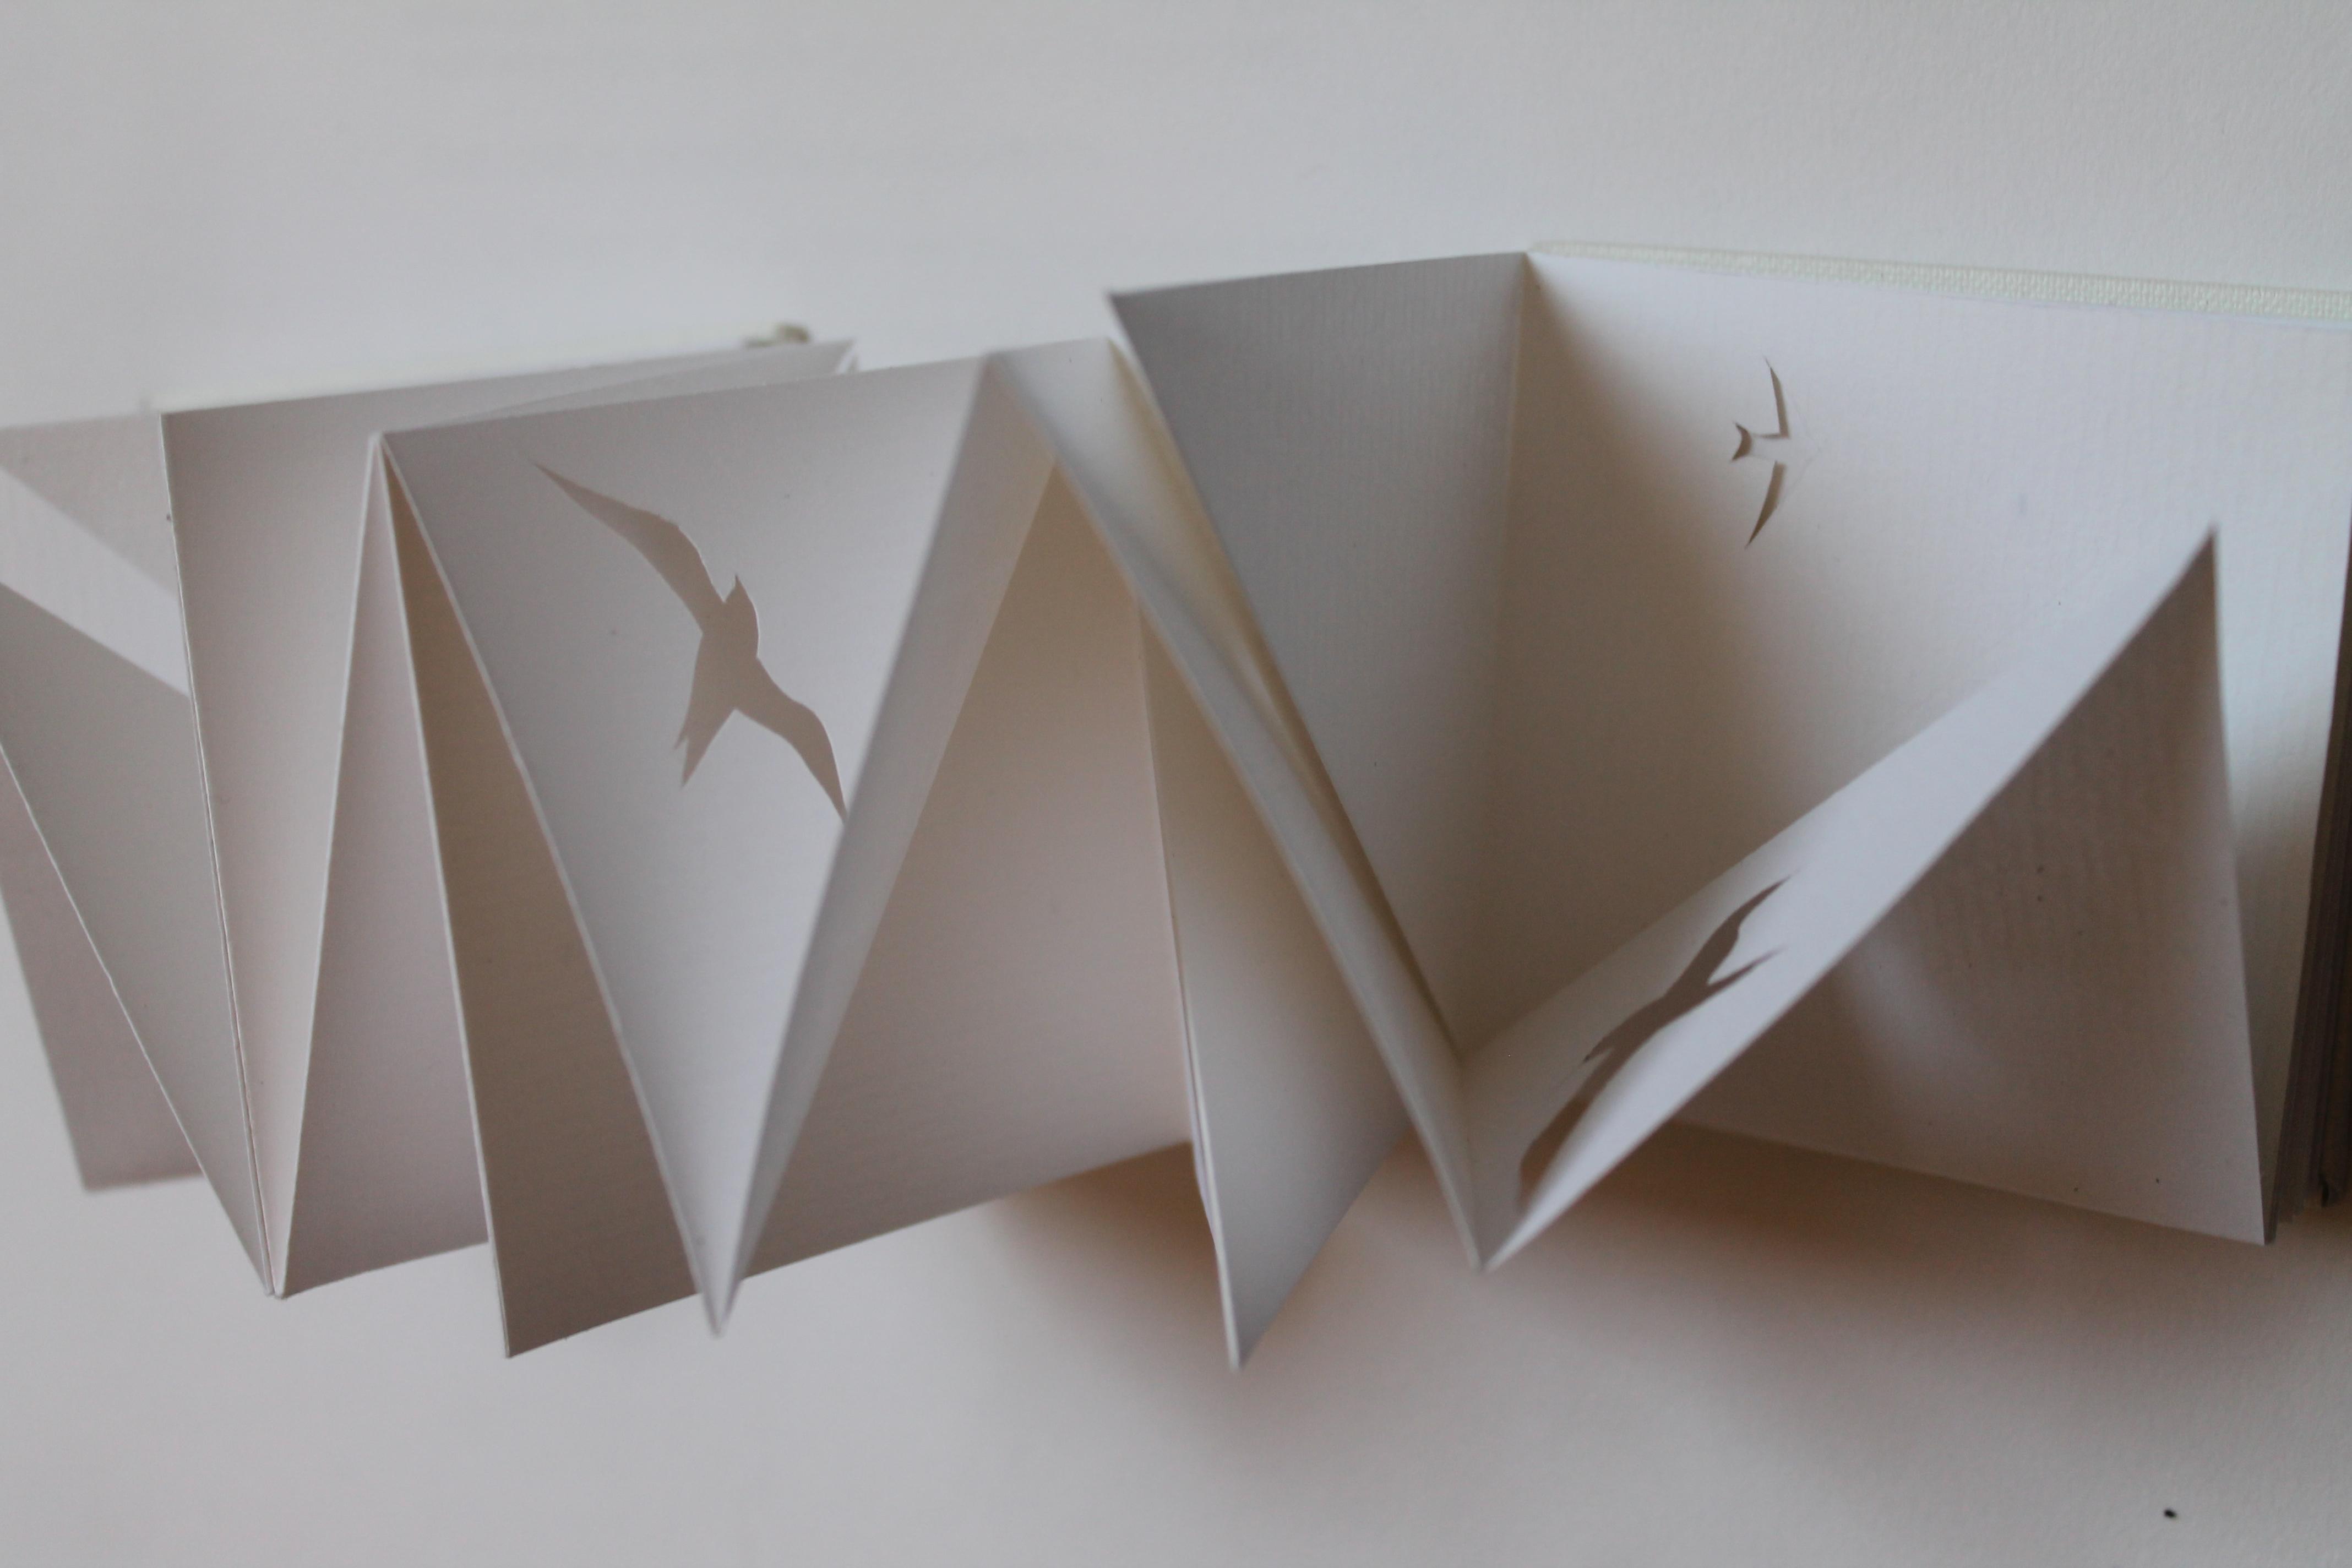 Intermediate bookbinding